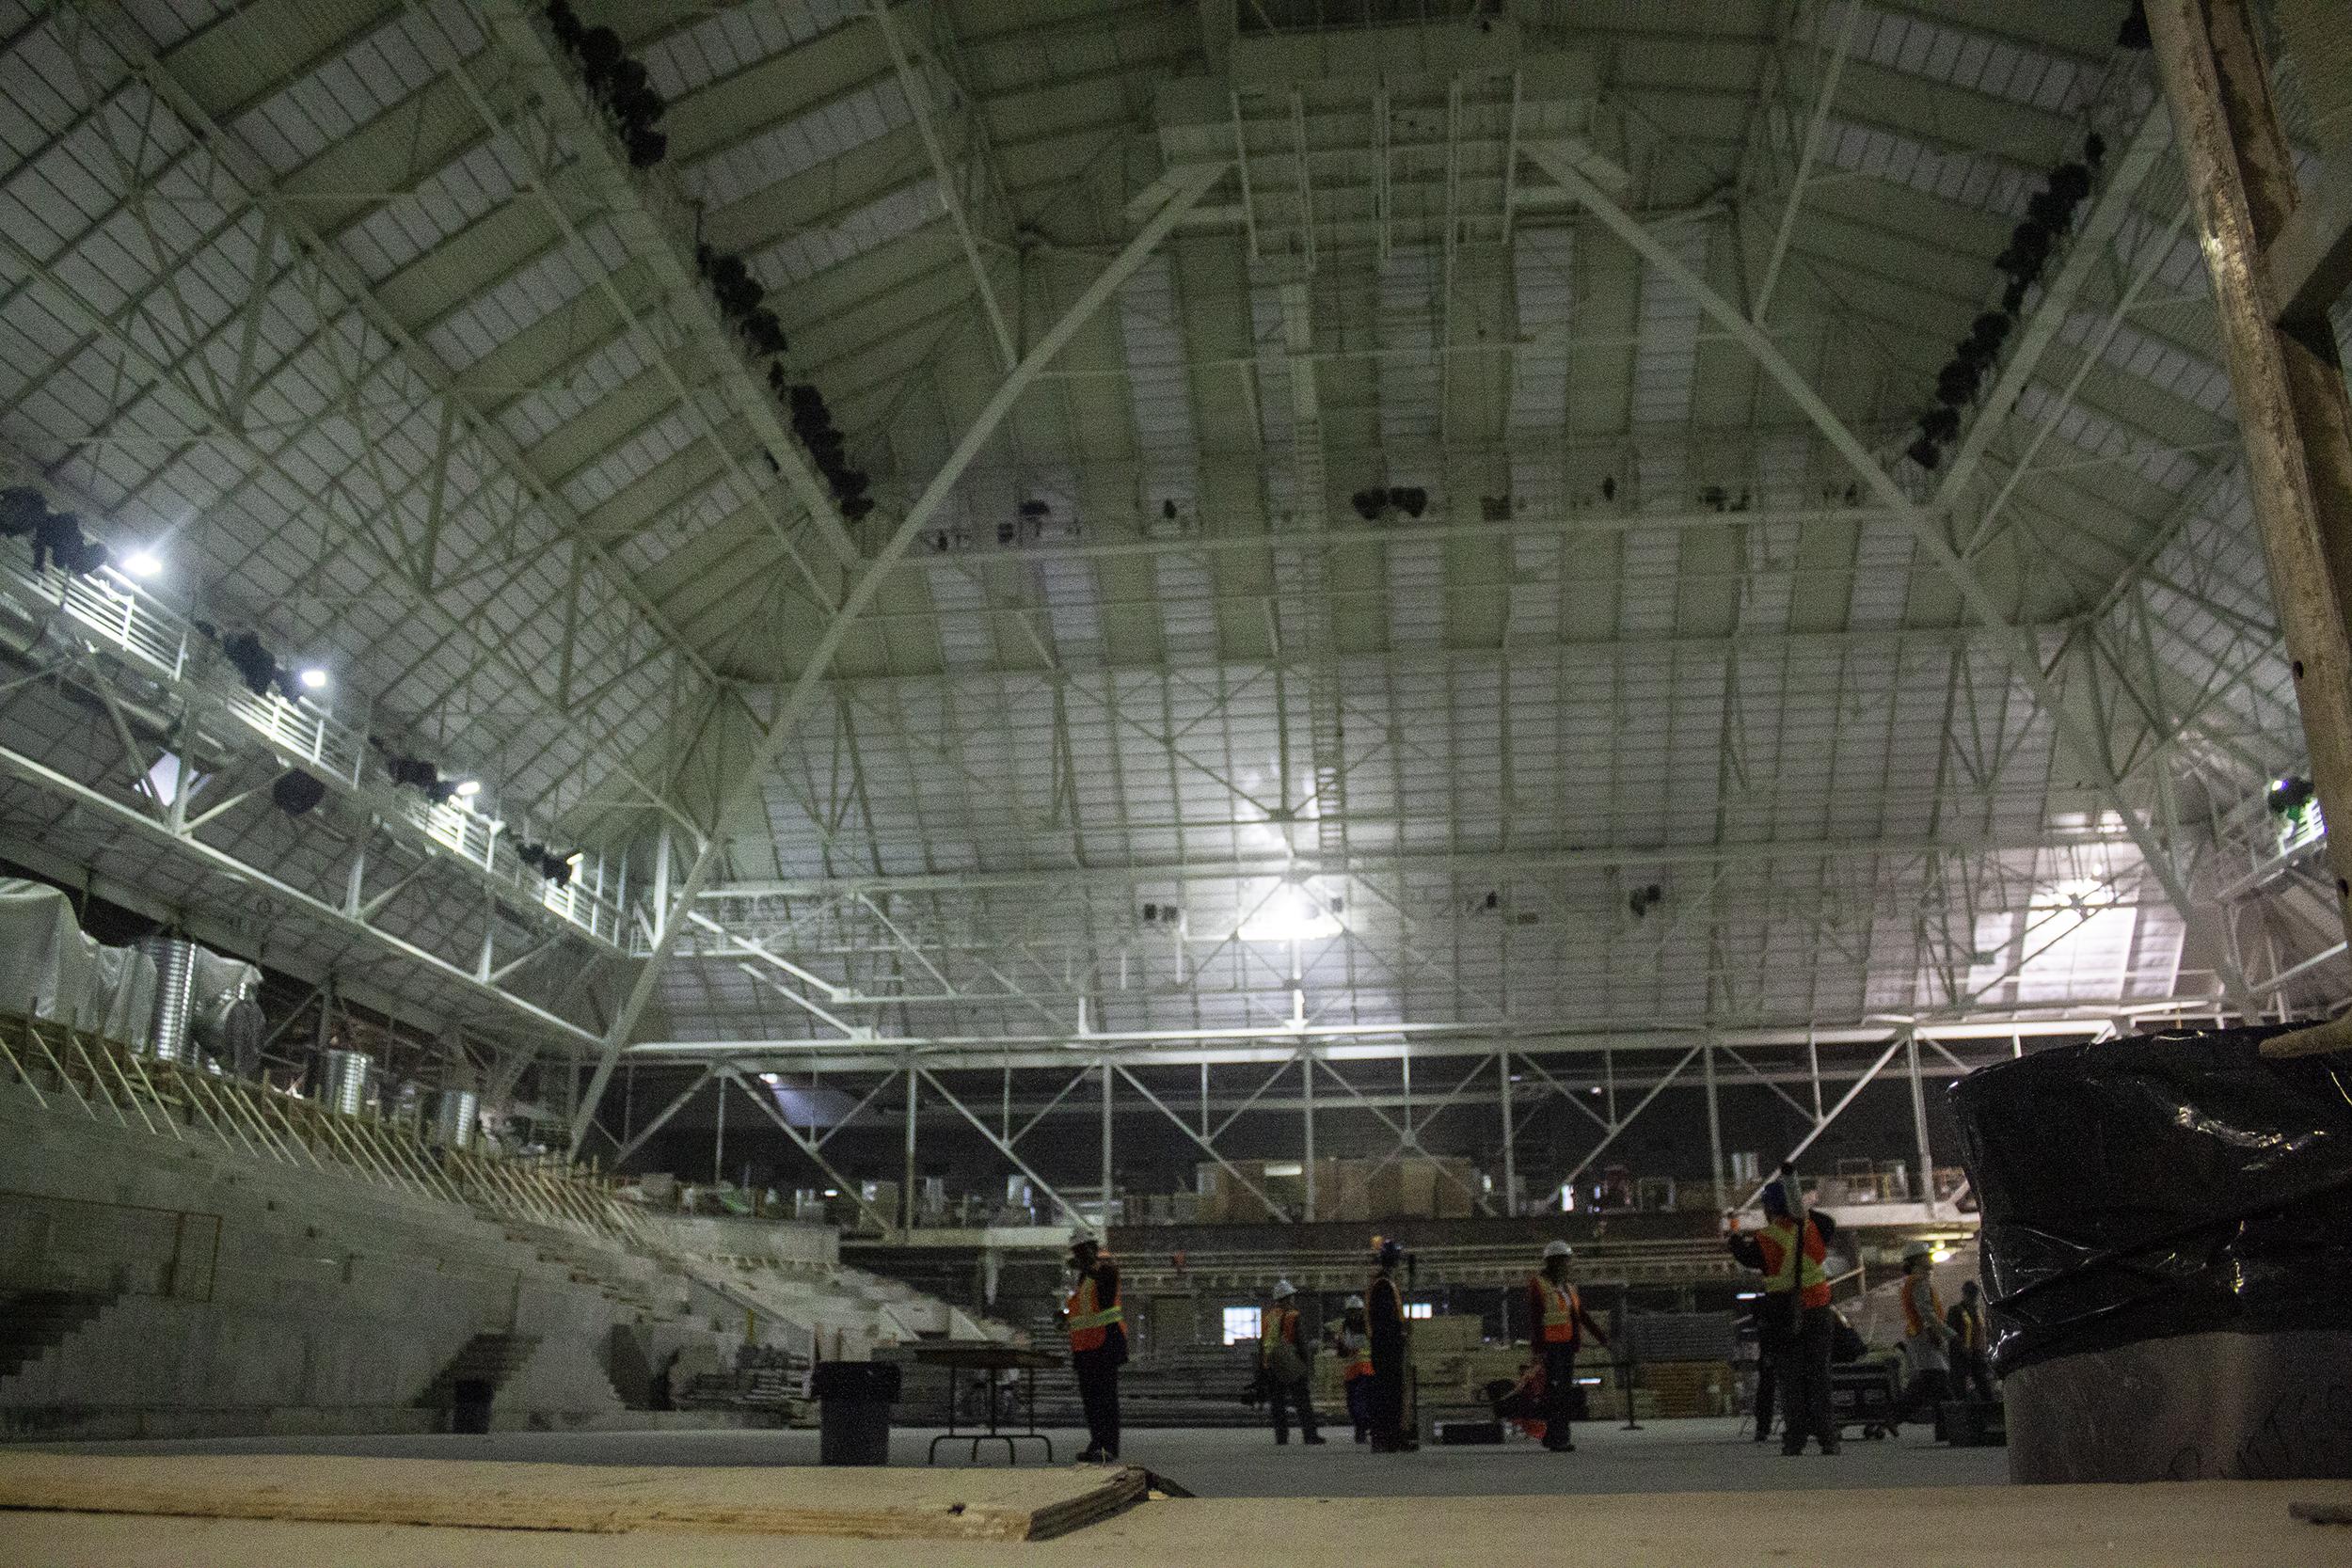 Ryerson University's Mattamy Athletic Centre under renovations pictured on Nov. 29, 2011. (Steve Silva)